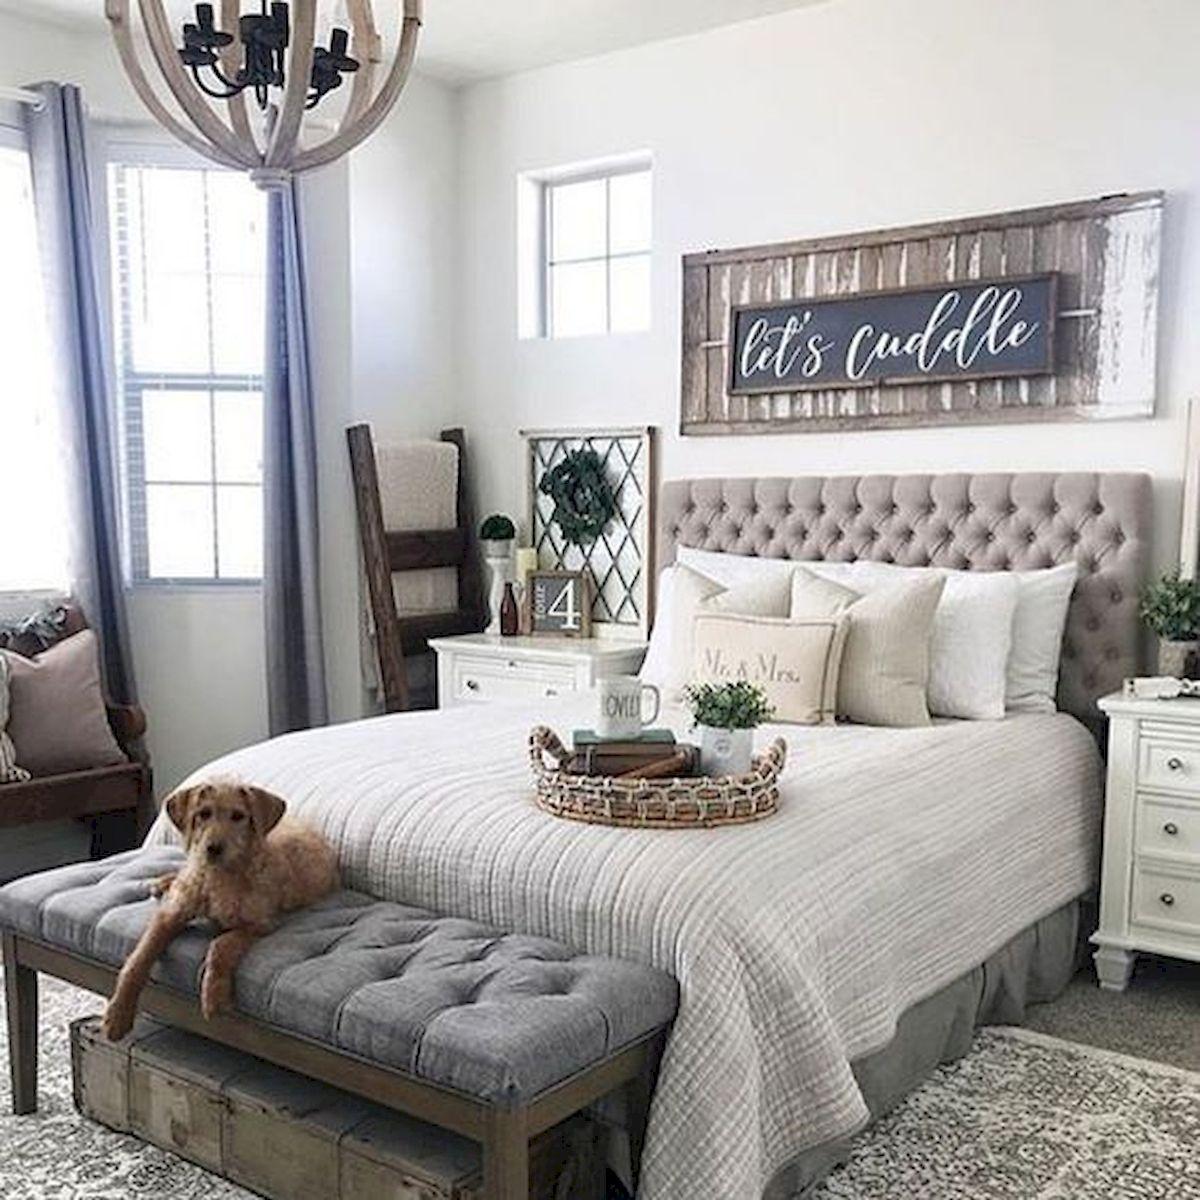 53 Farmhouse Wall Decor Ideas For Bedroom 51 Ideaboz Farmhousebedroomfurnituresets In 2020 Rustic Master Bedroom Master Bedrooms Decor Remodel Bedroom